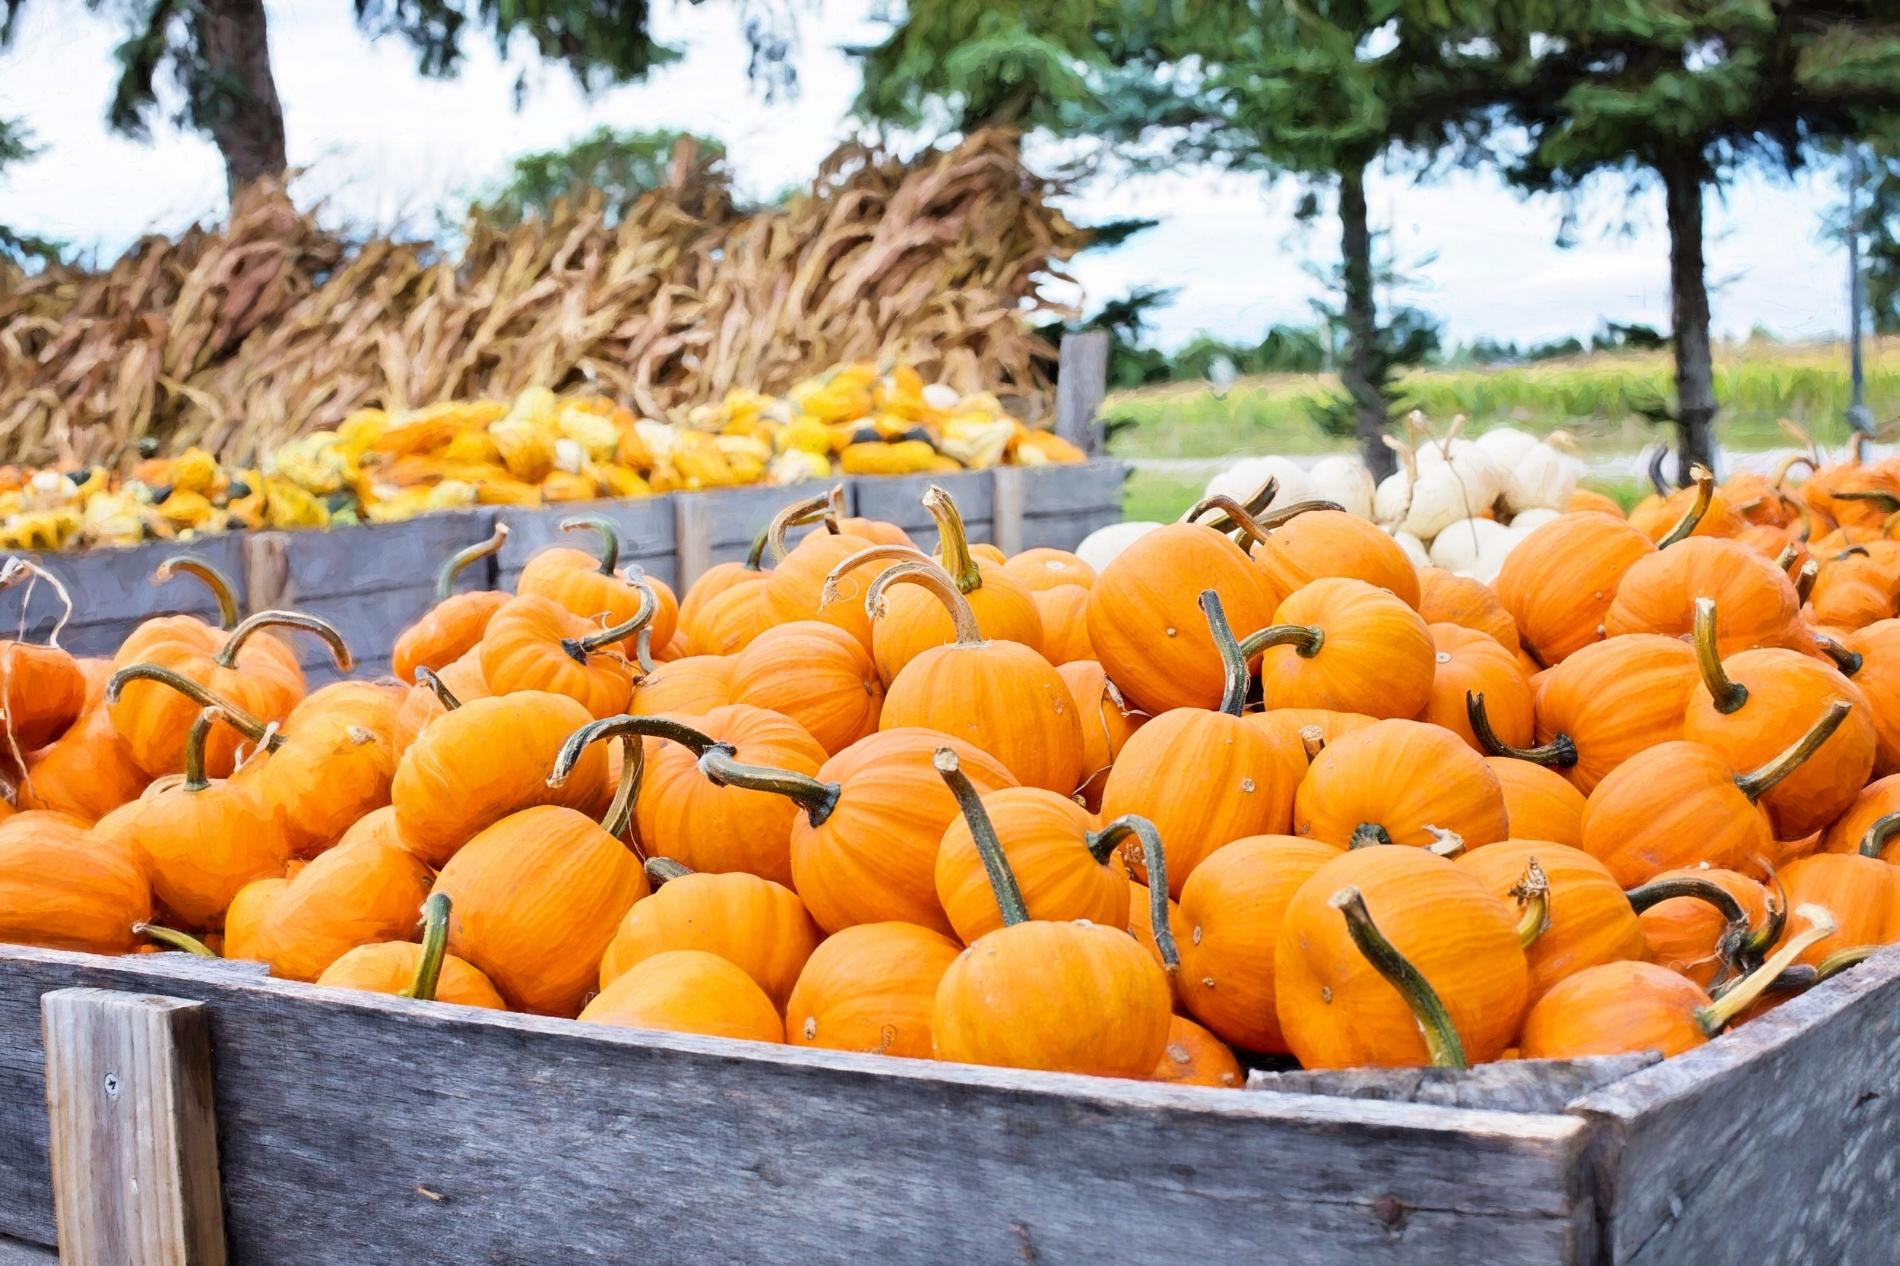 agriculture-autumn-cropland-265315.jpg